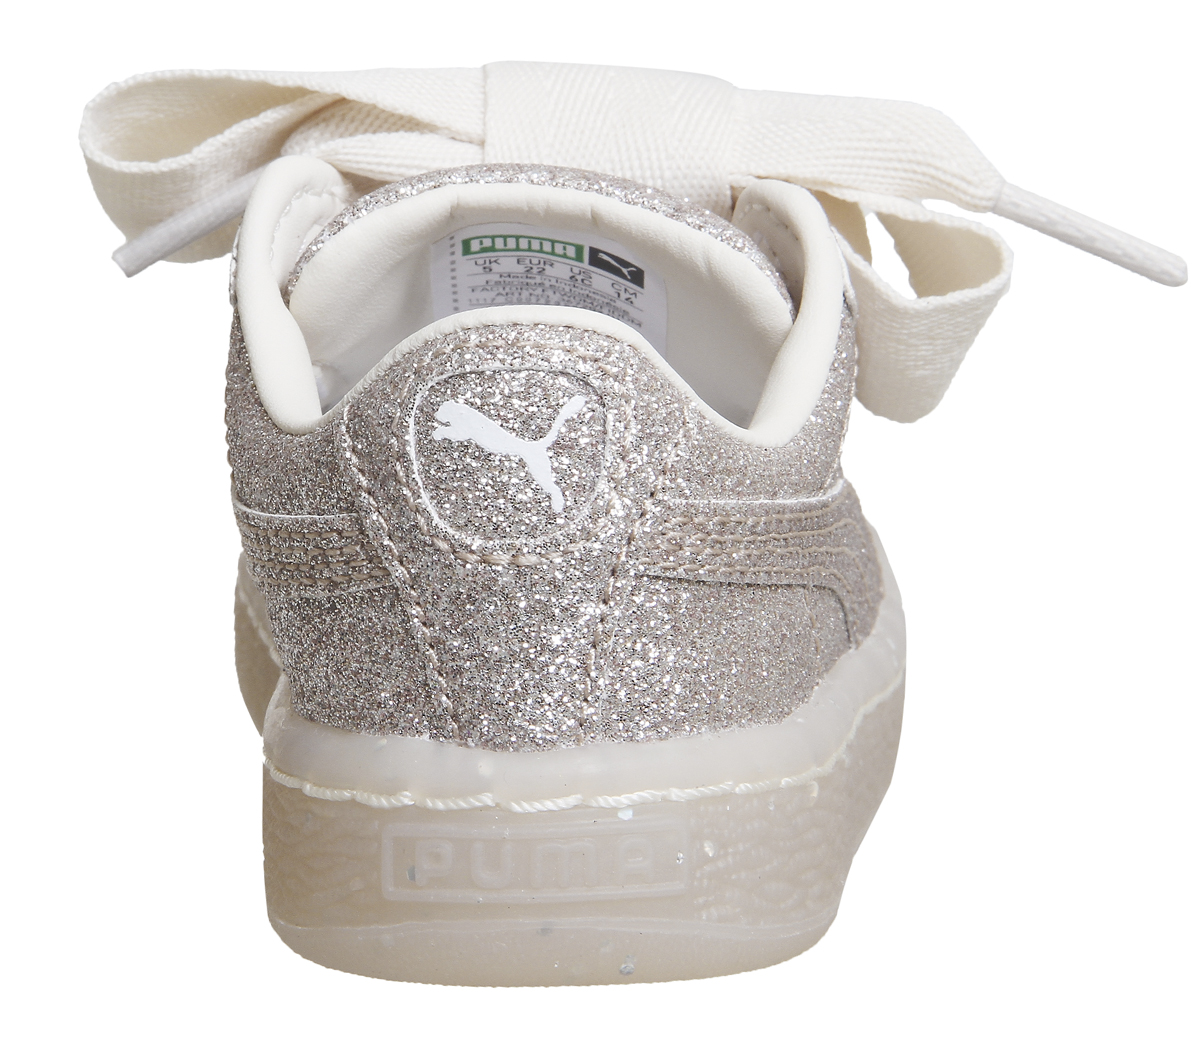 431c06acf61c Sentinel Kids Puma Basket Heart Inf Eggnog Glitter Exclusive Kids